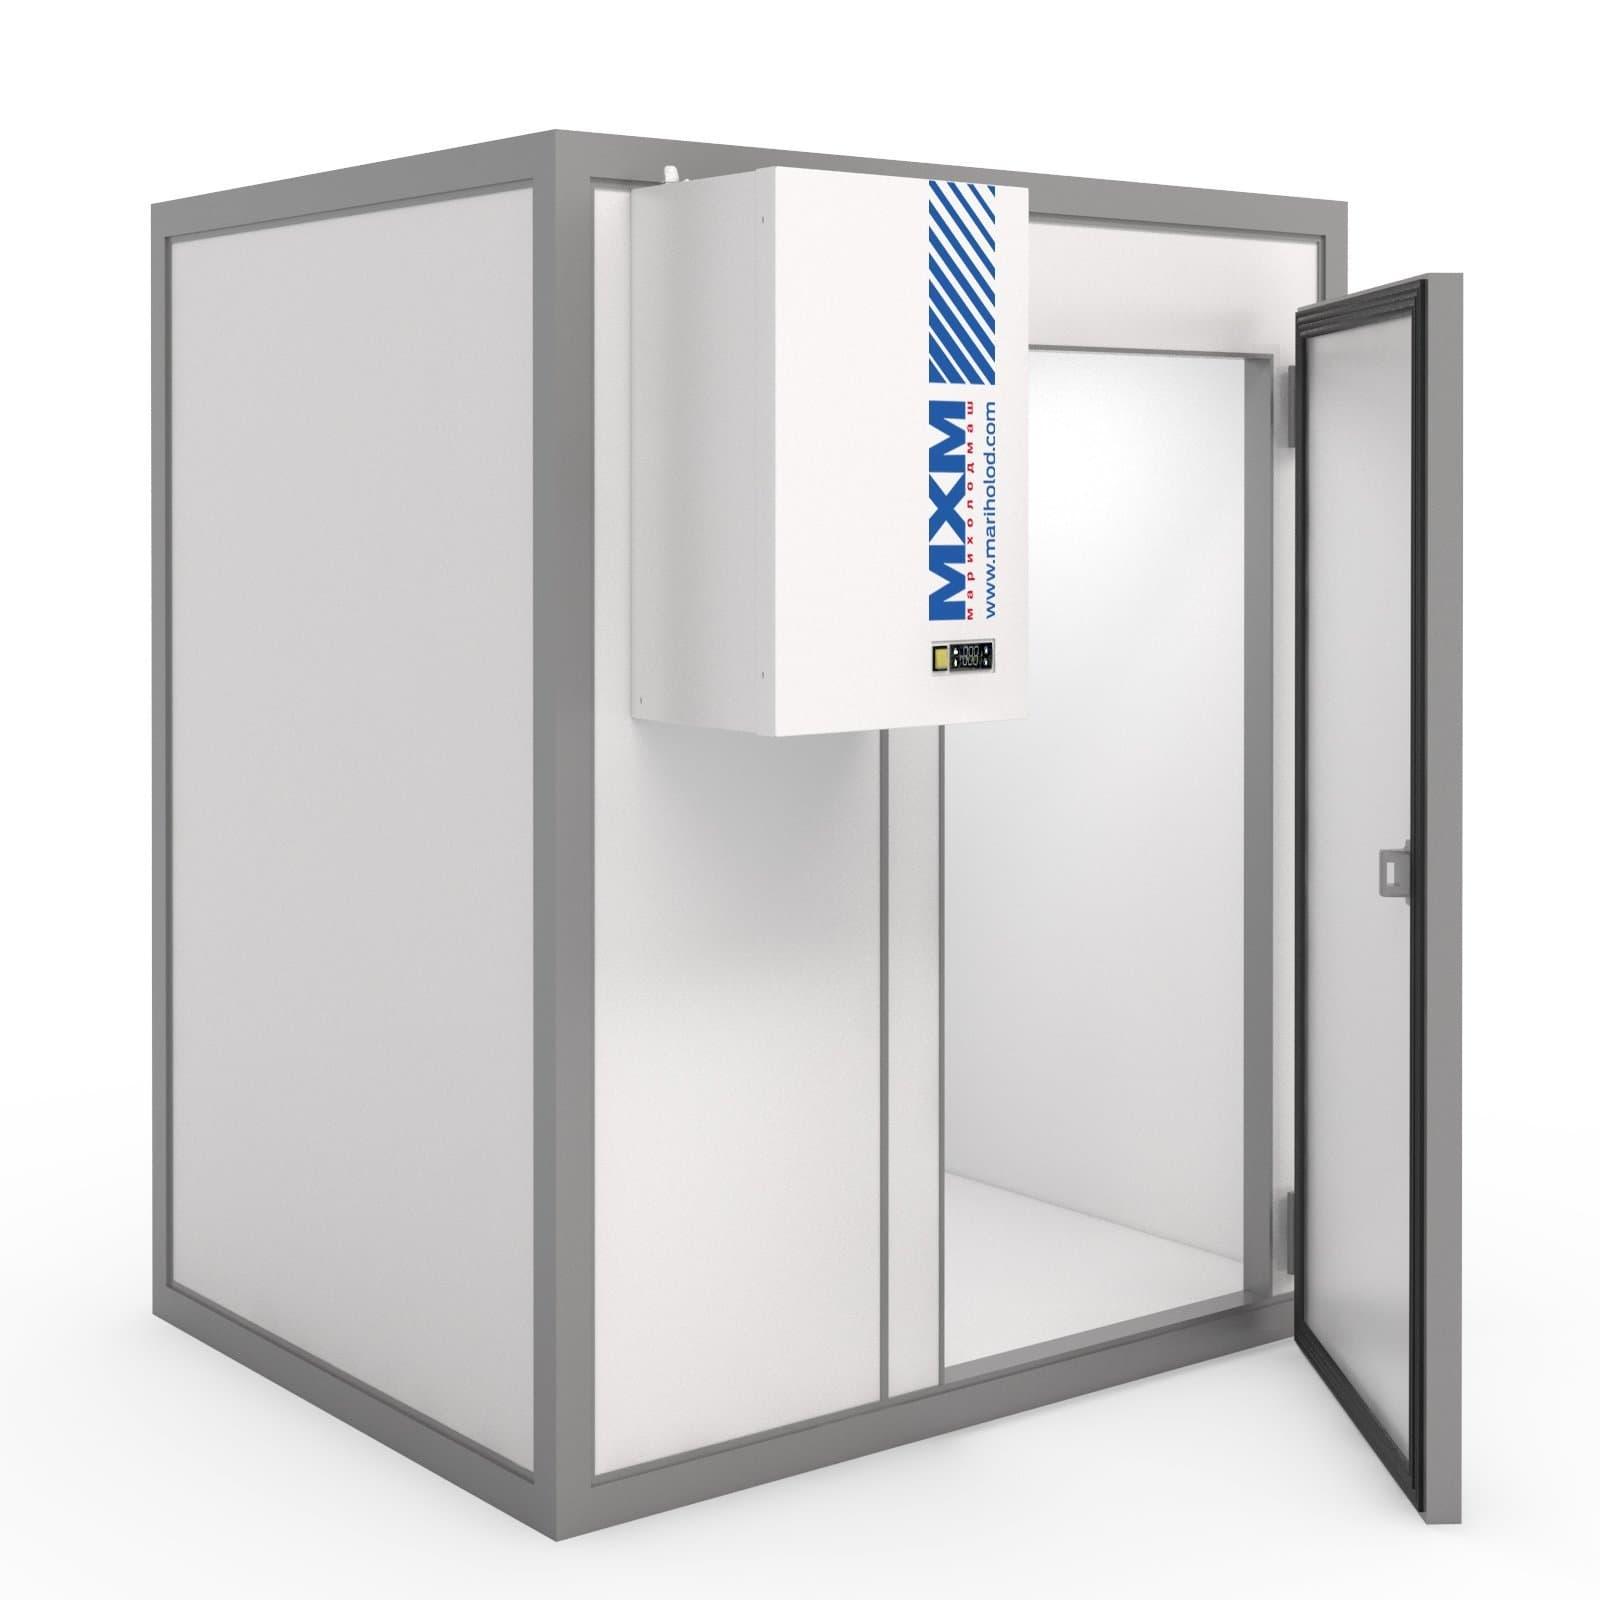 Камера холодильная КХН-114,28 (2560×18760×2720 мм)